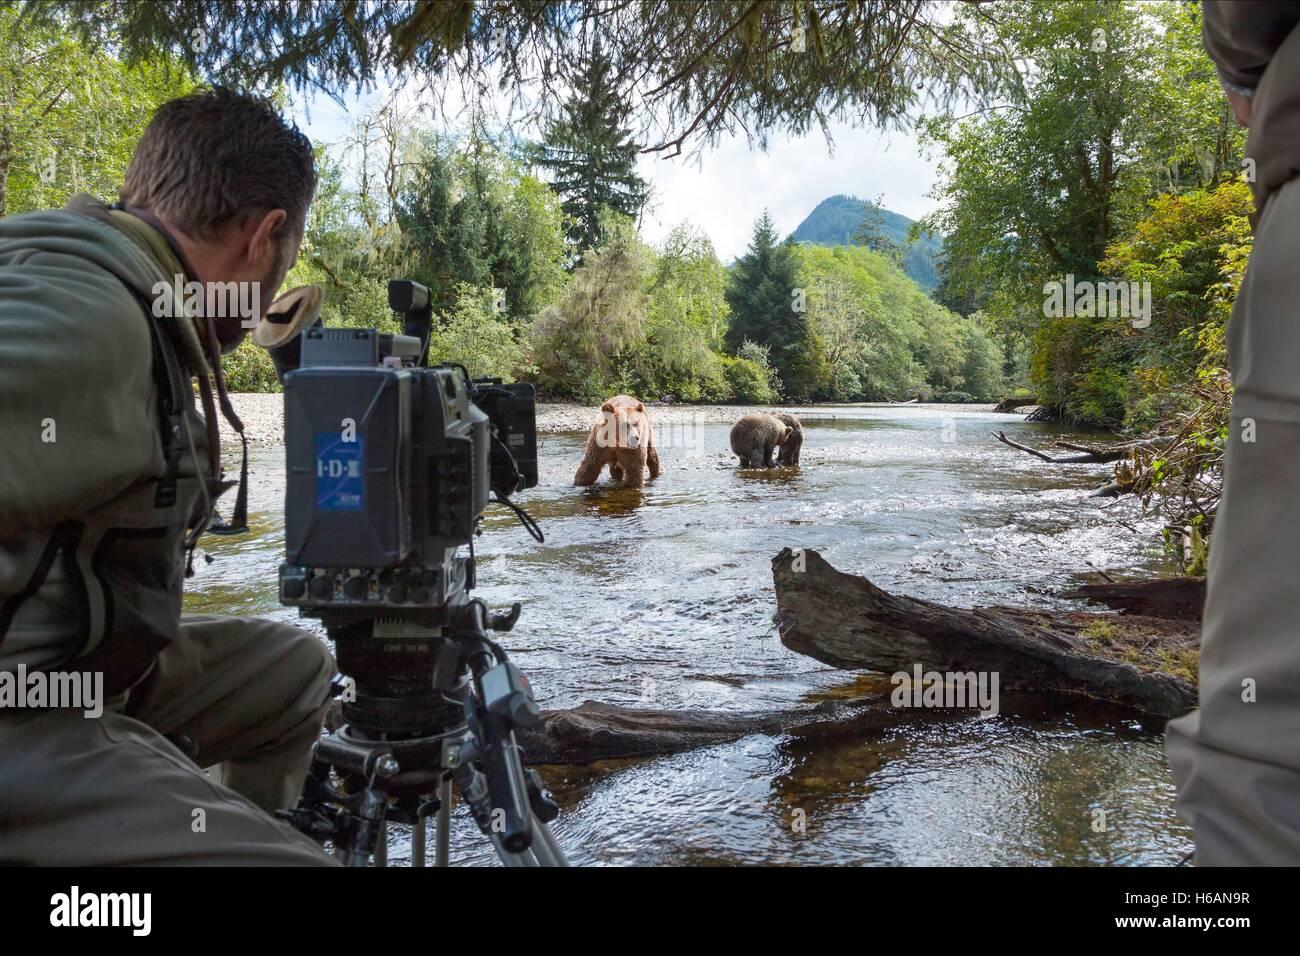 CAMERMAN FILMS BEARS BEARS (2014) - Stock Image